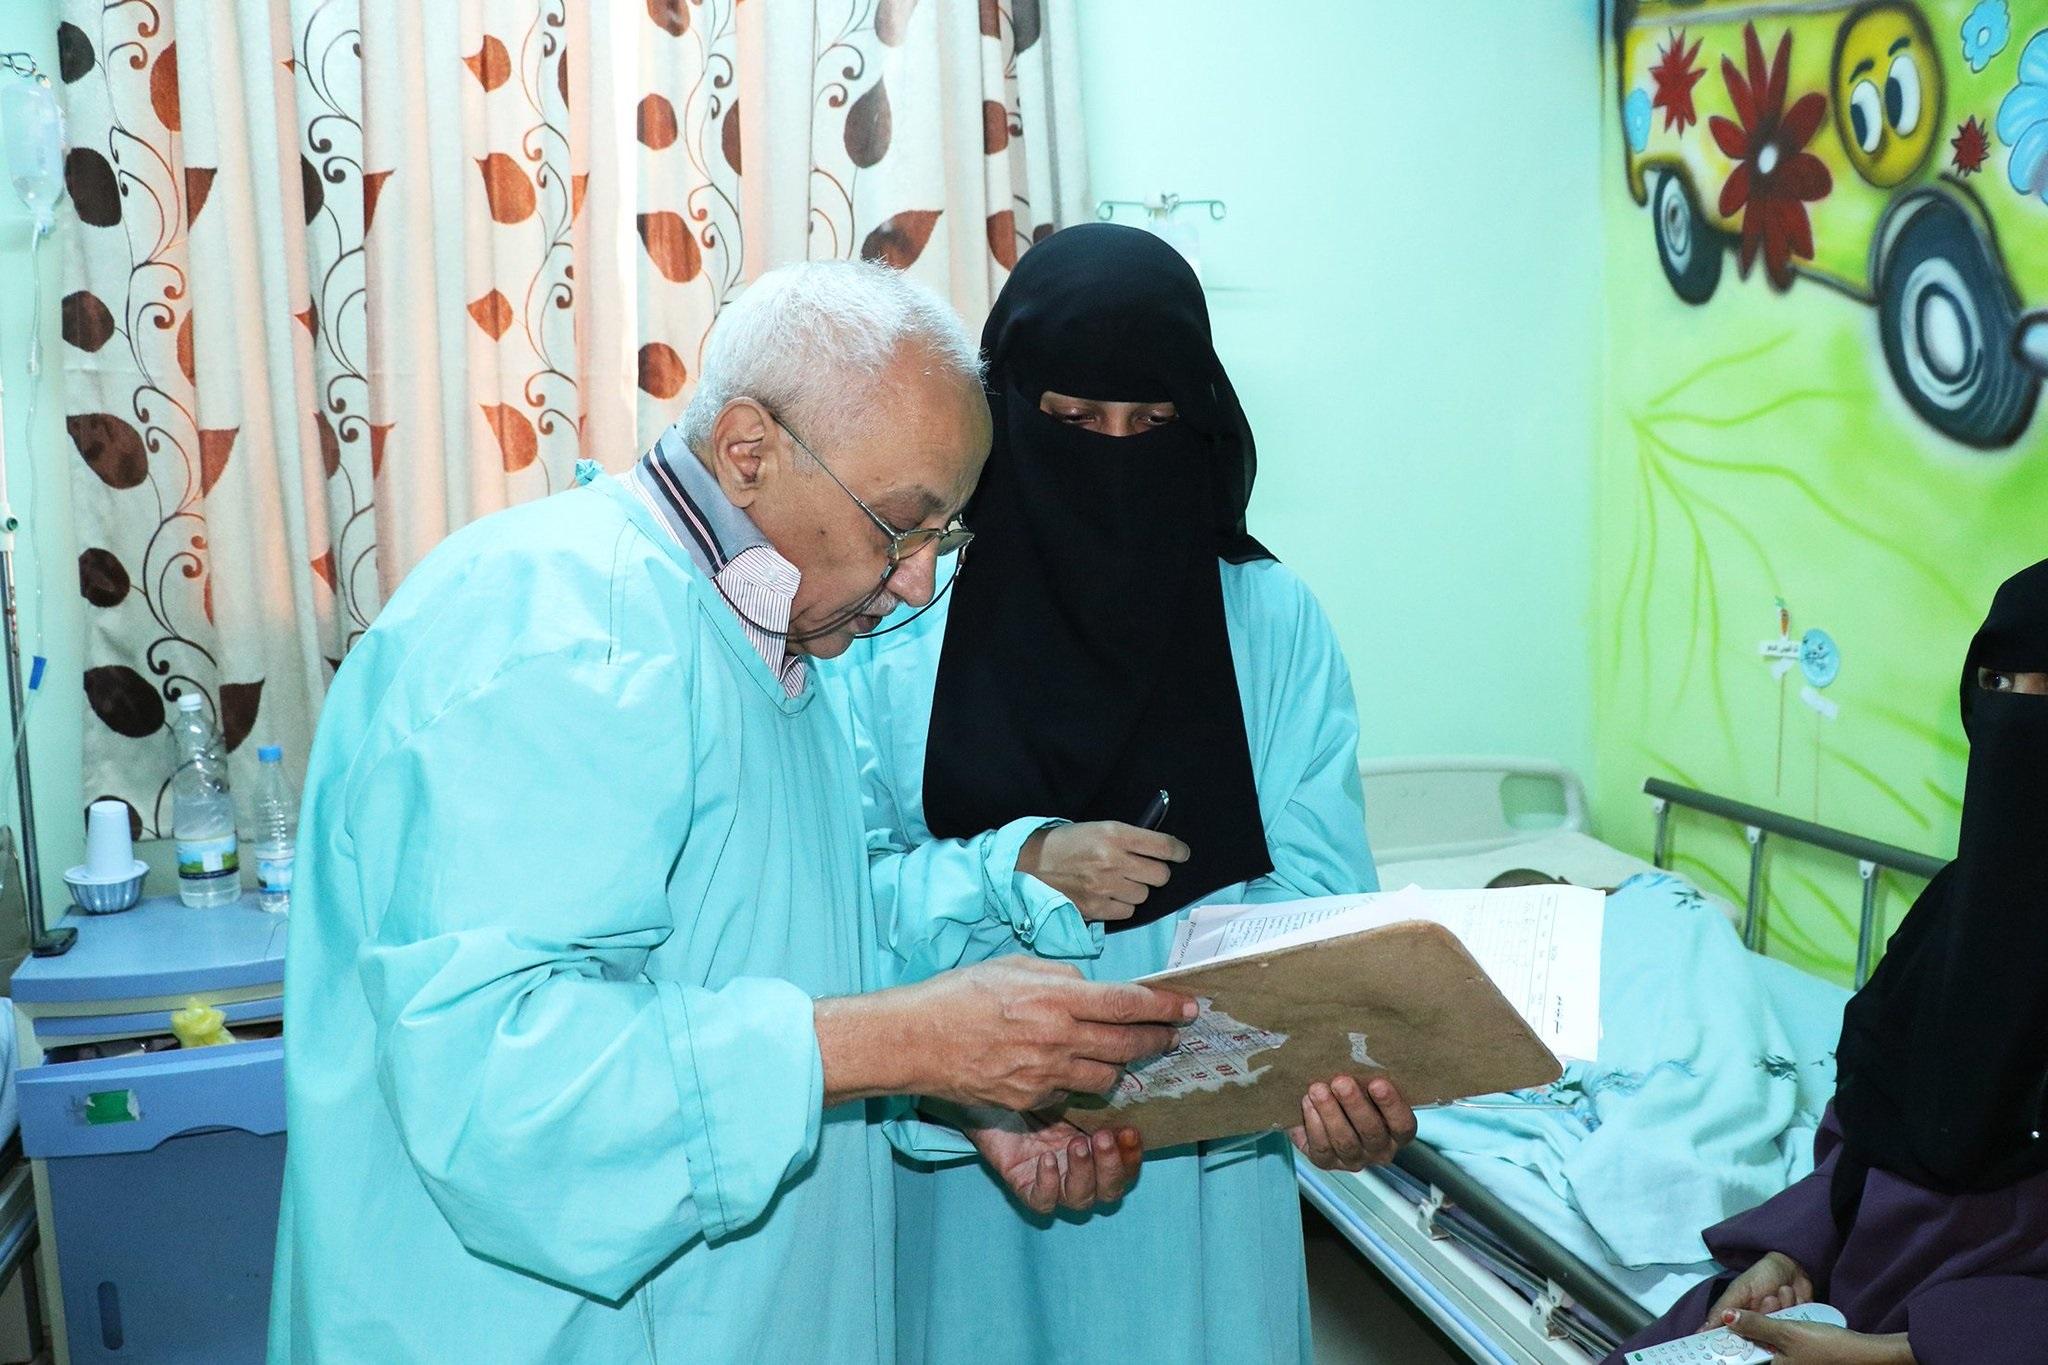 Dr Abdulrahman Al-Hadi faces a sad reality daily